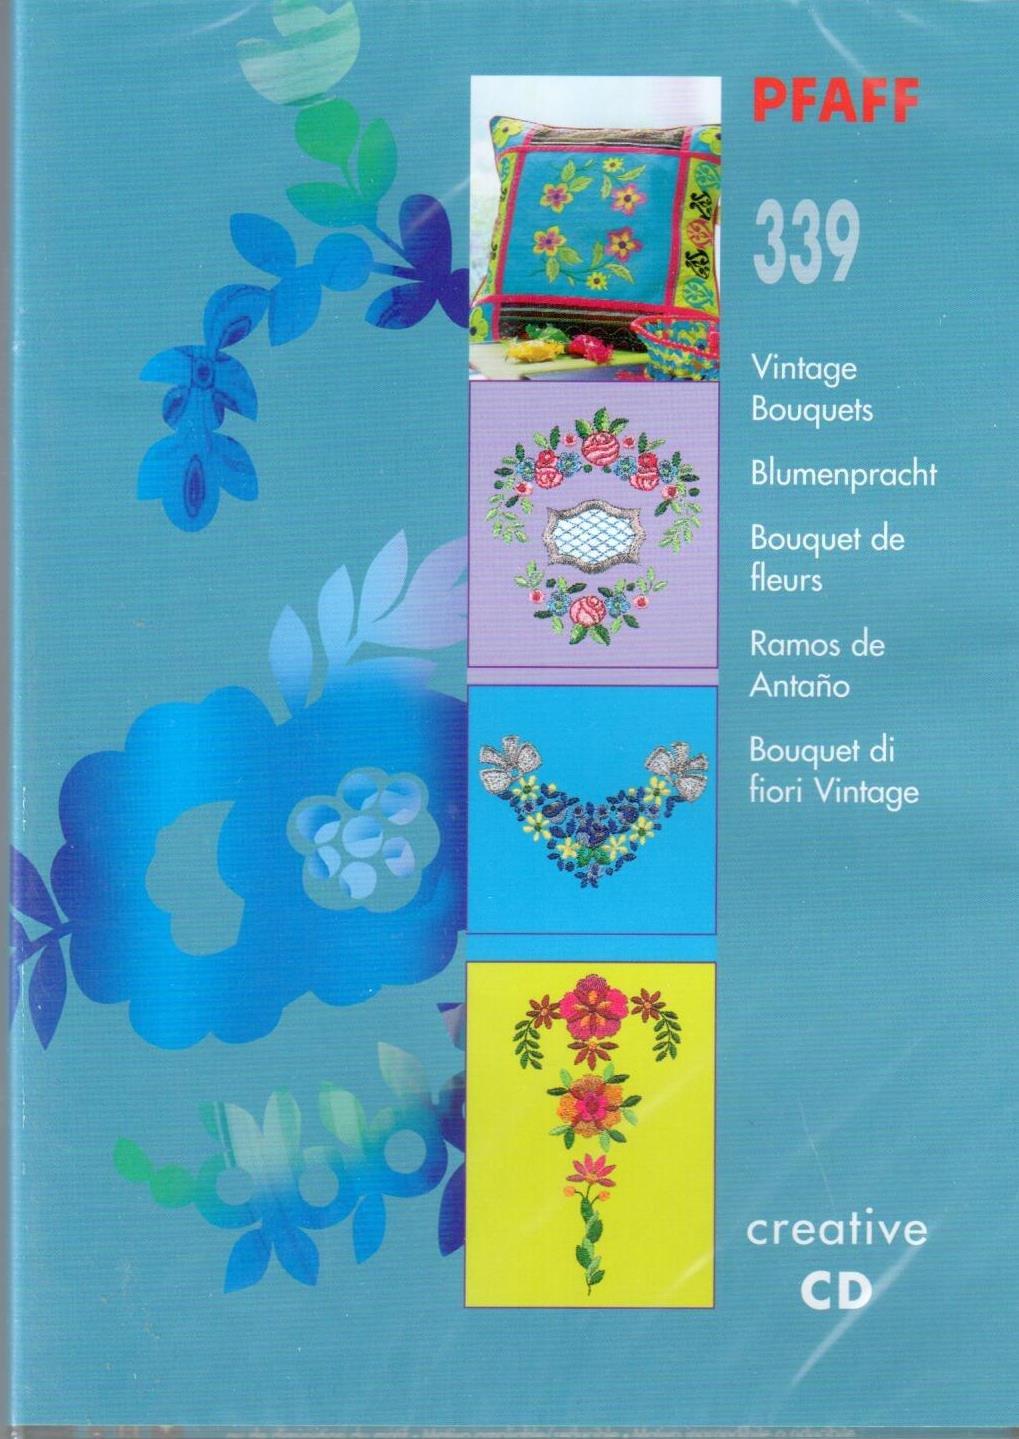 Pfaff Creative CD 339 Vintage Bouquets